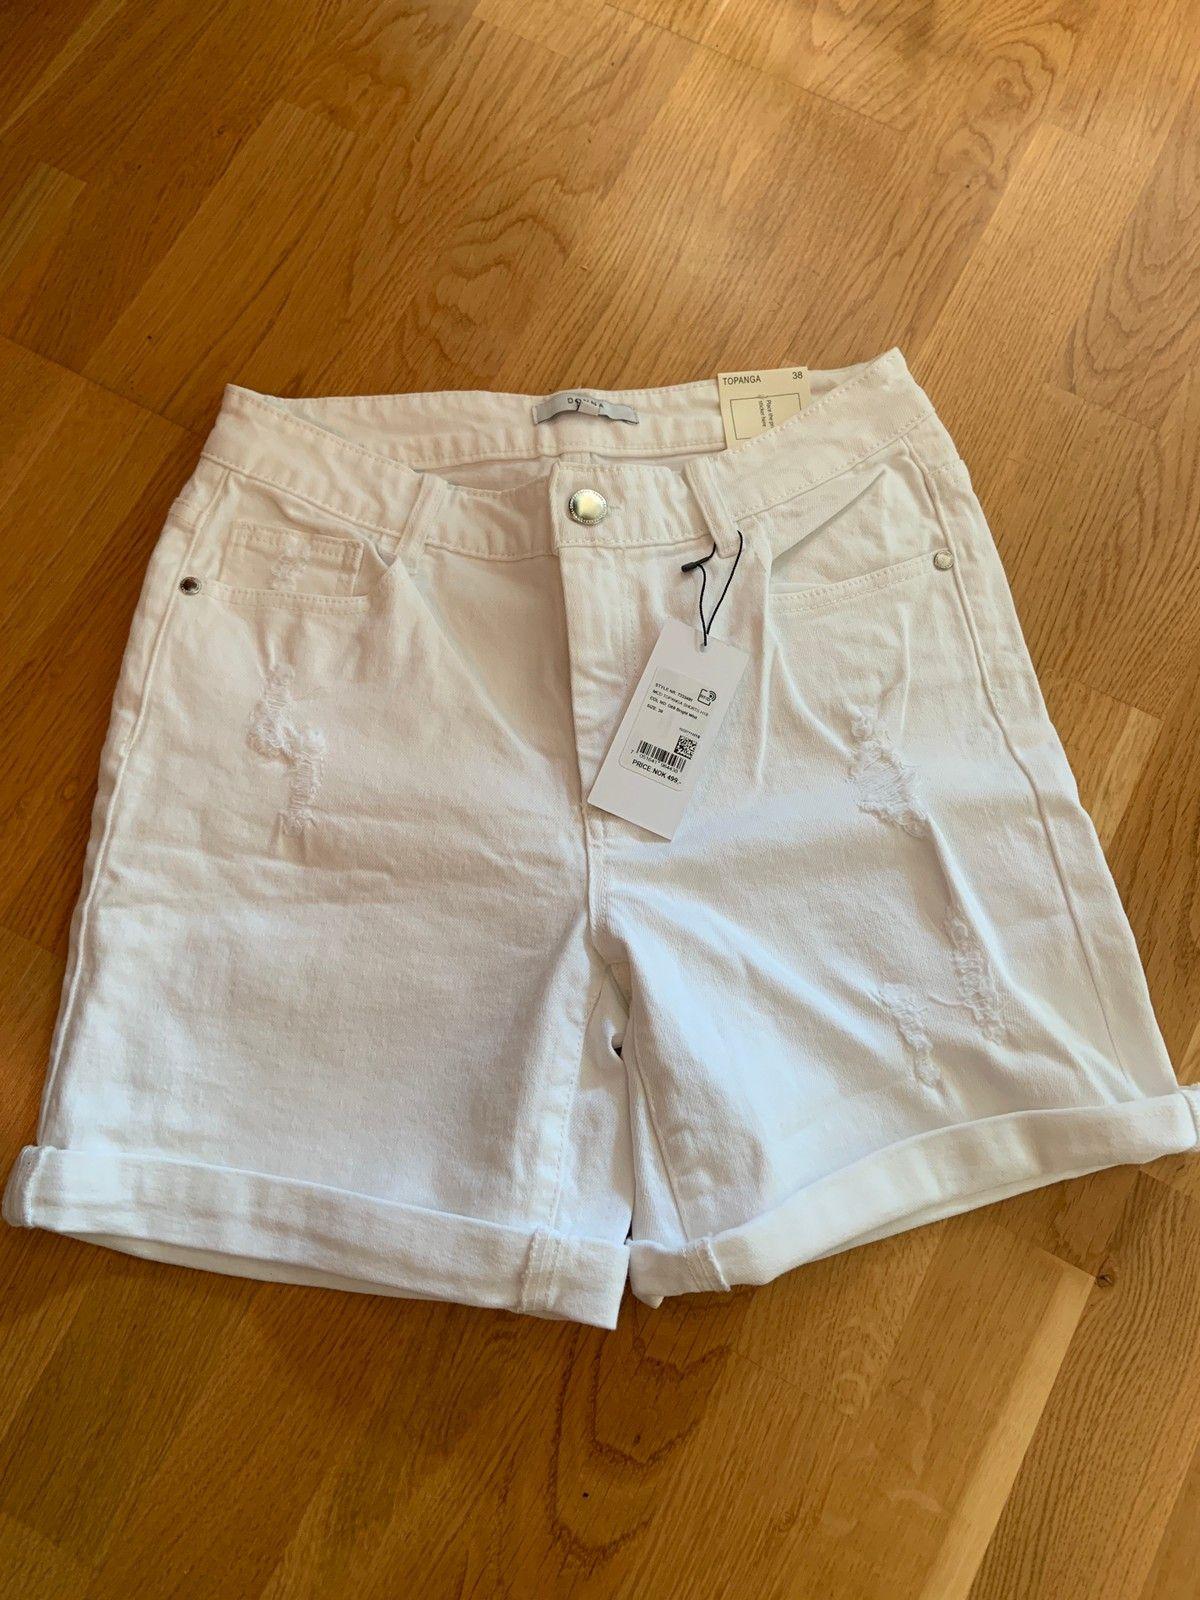 d8f6d52f Hvit shorts dame str 38 | FINN.no